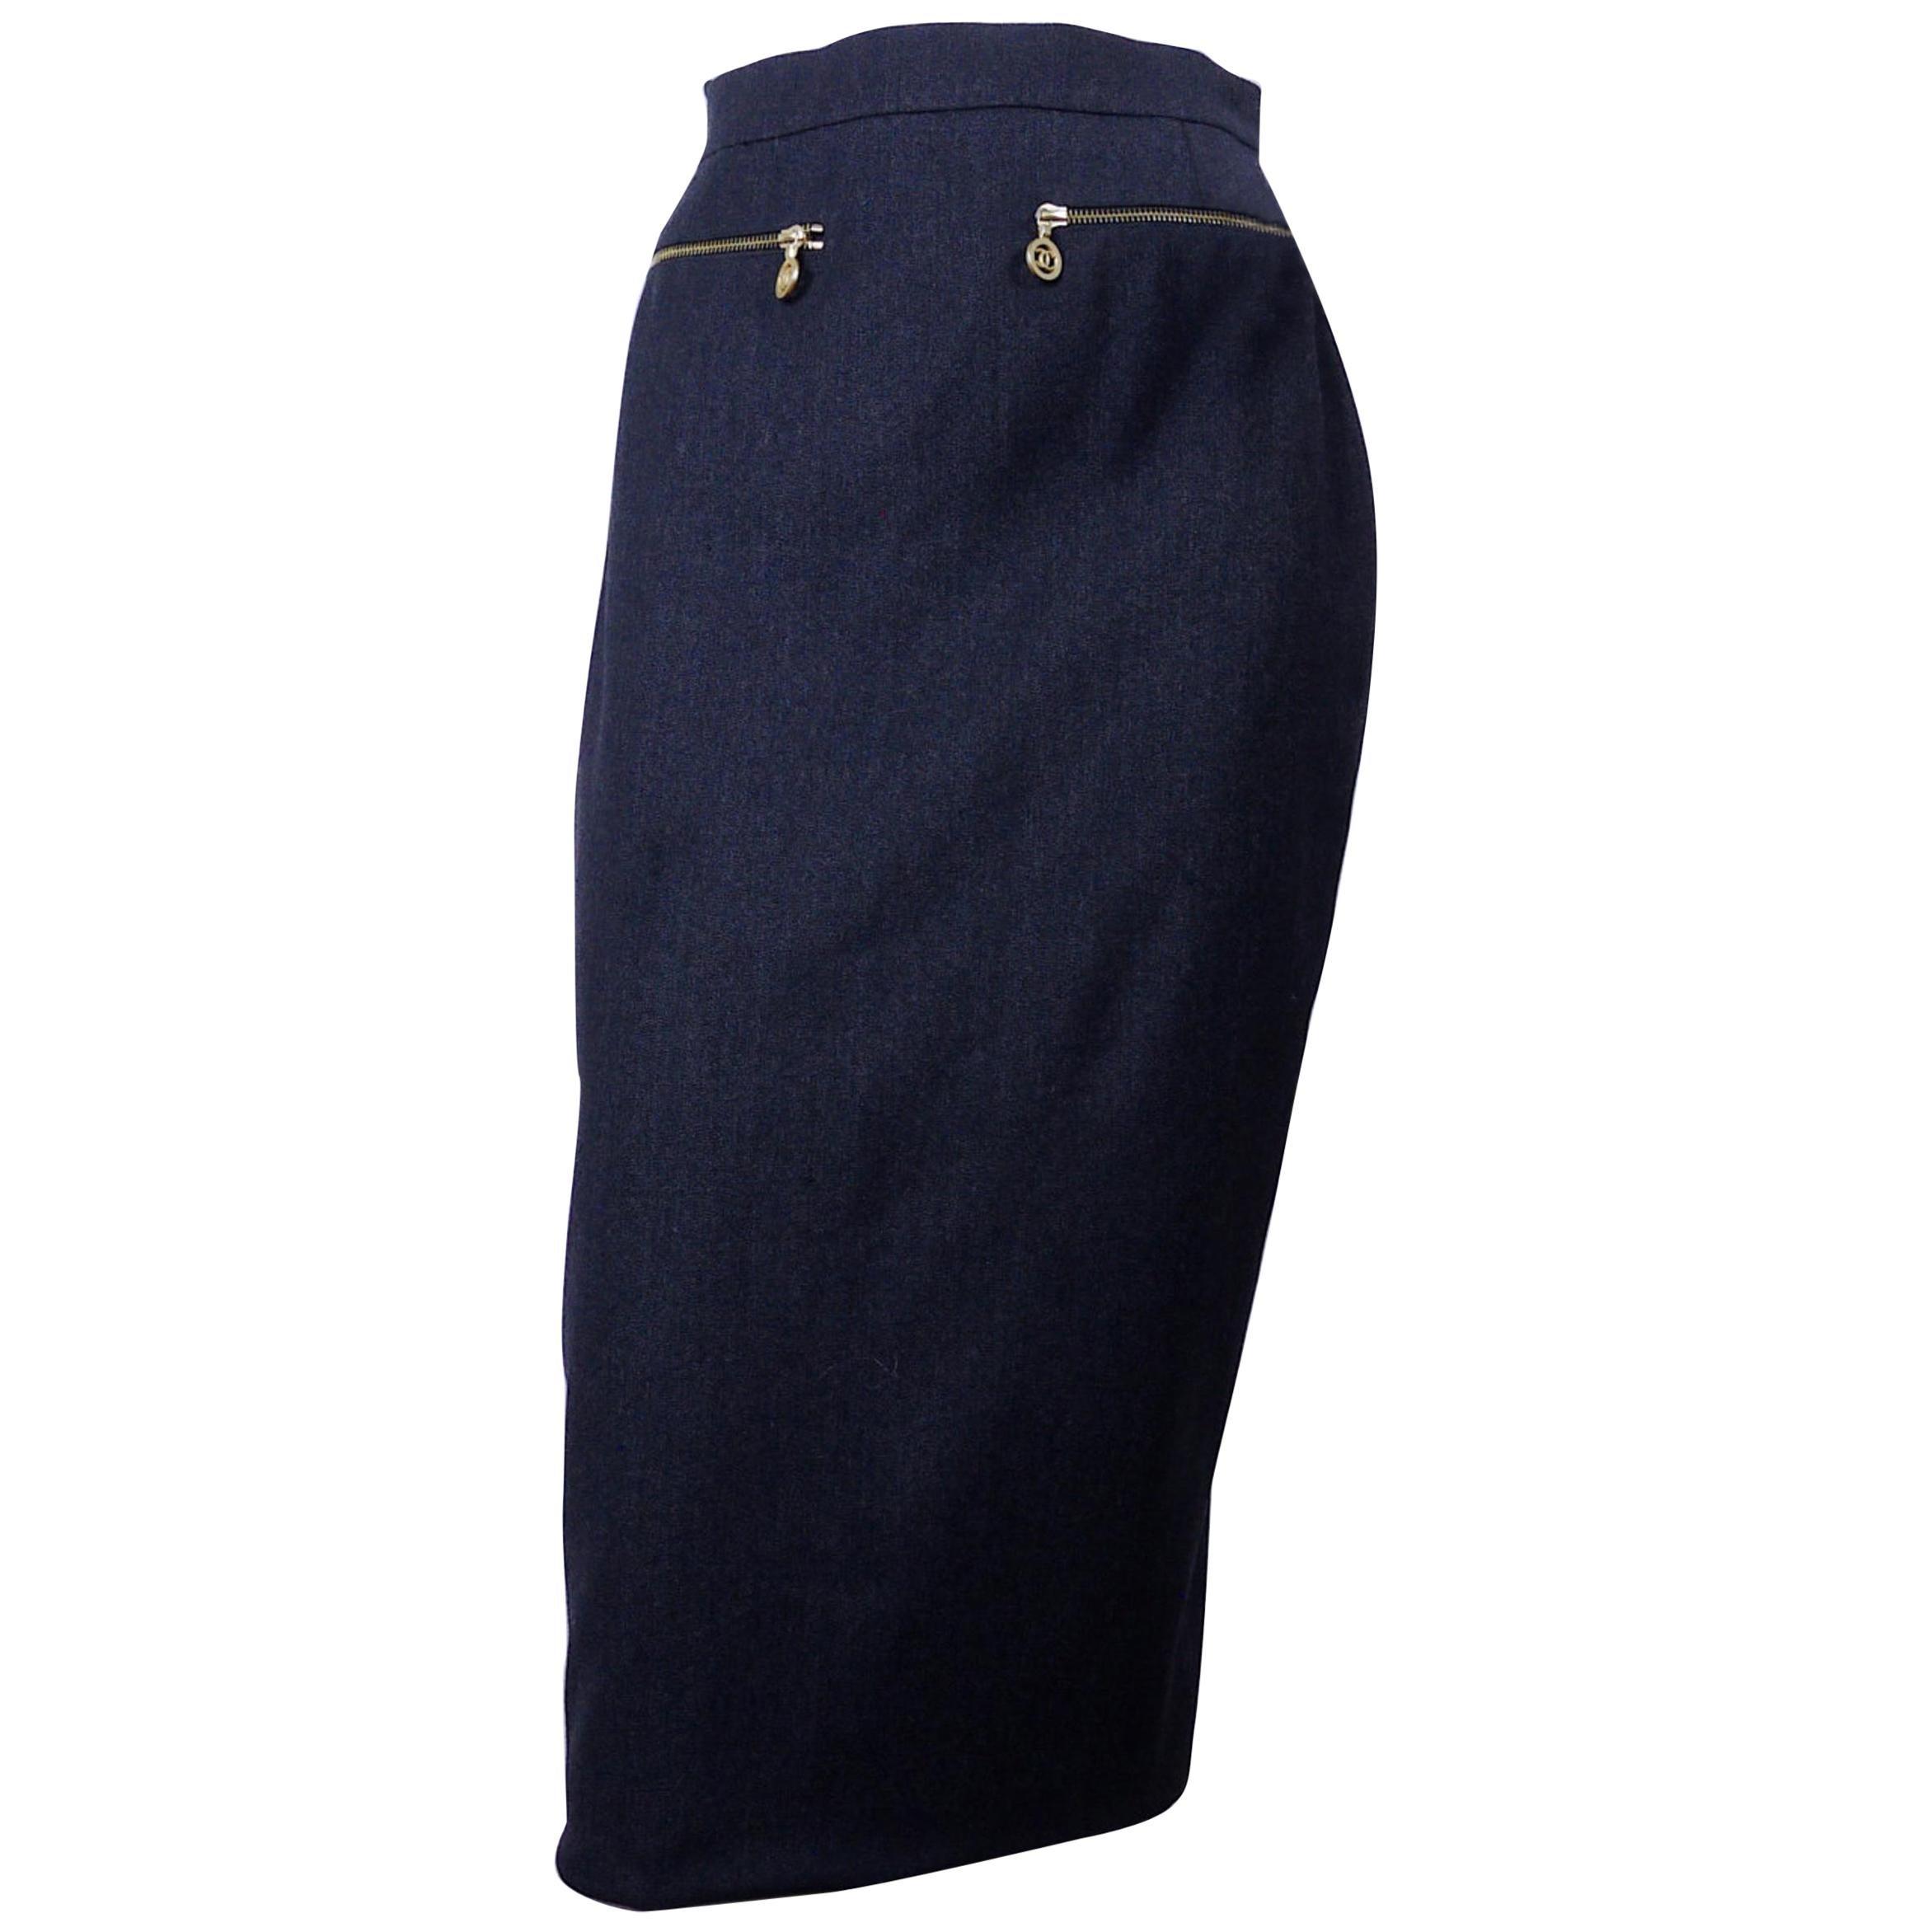 Vintage RARE CHANEL CC Medallion Zippered Pencil Skirt